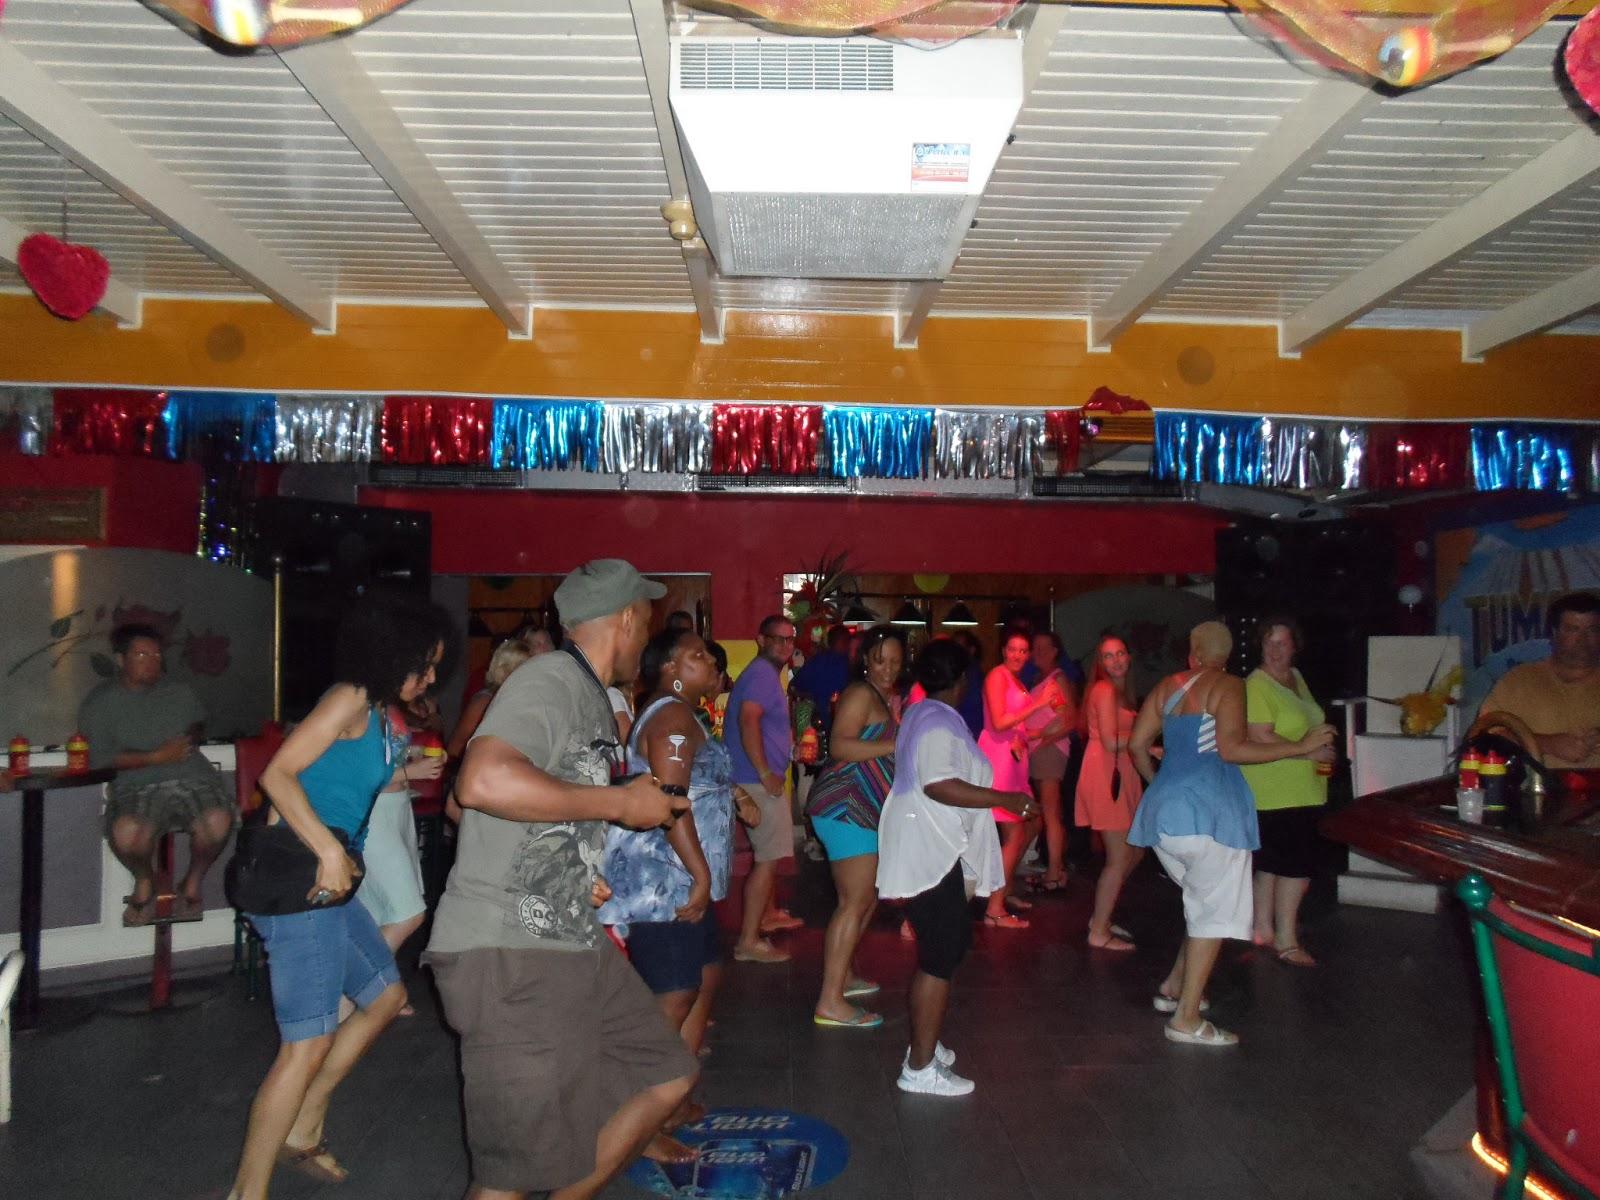 Sam S Club Travel Aruba